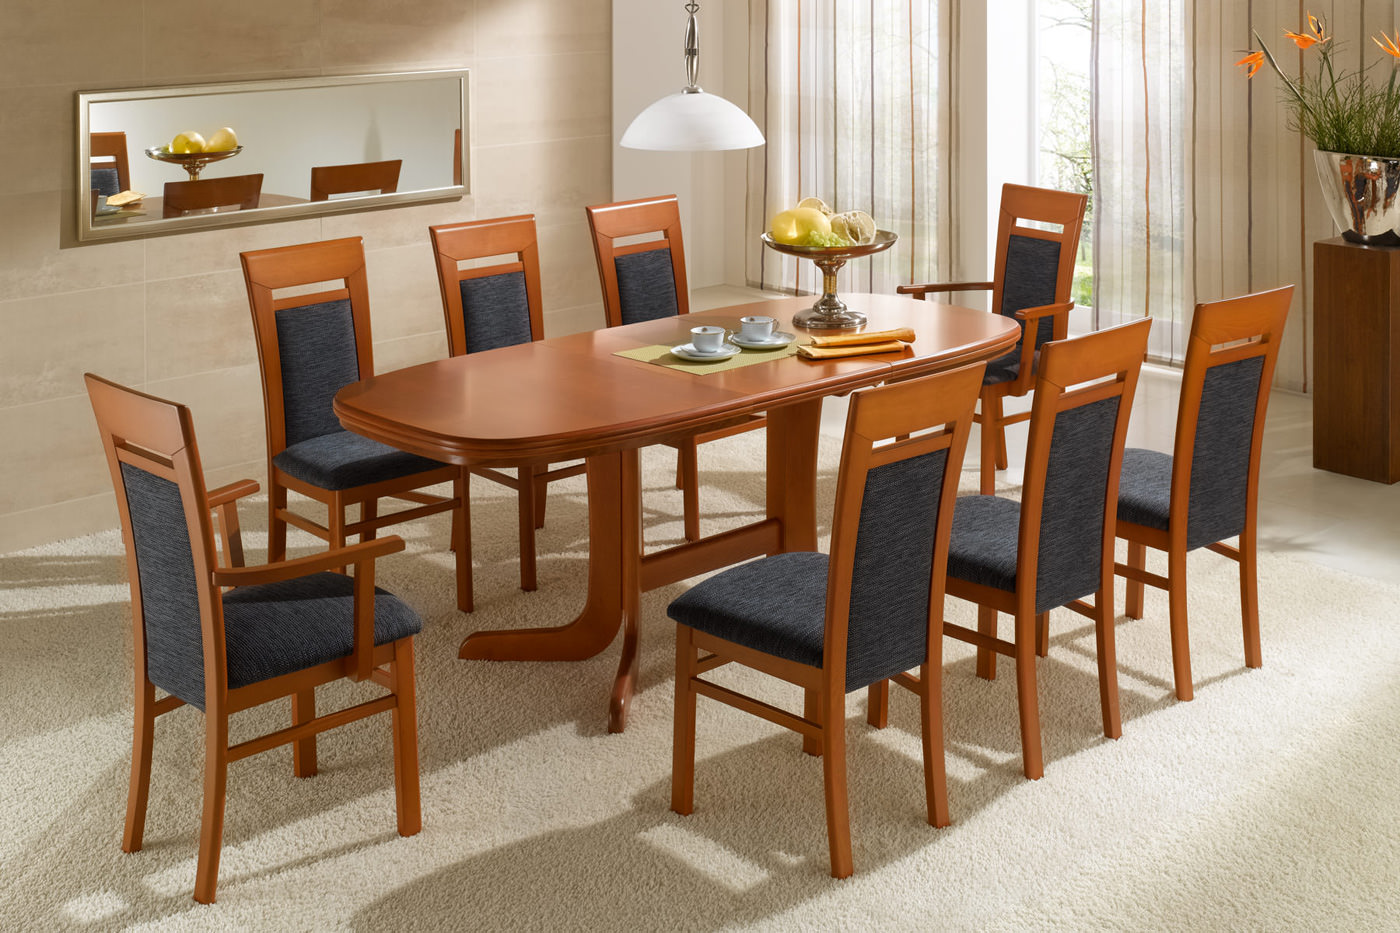 esszimmerm bel tische st hle und eckb nke. Black Bedroom Furniture Sets. Home Design Ideas